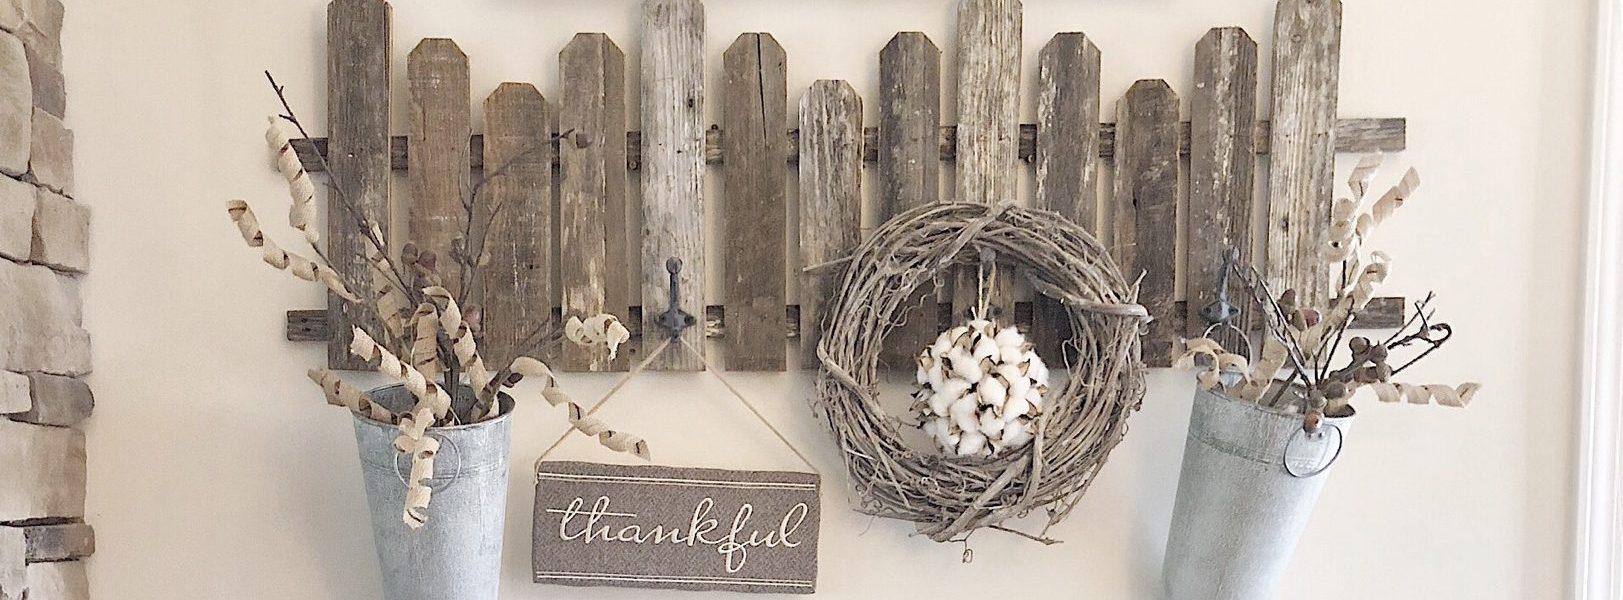 thankful + grateful